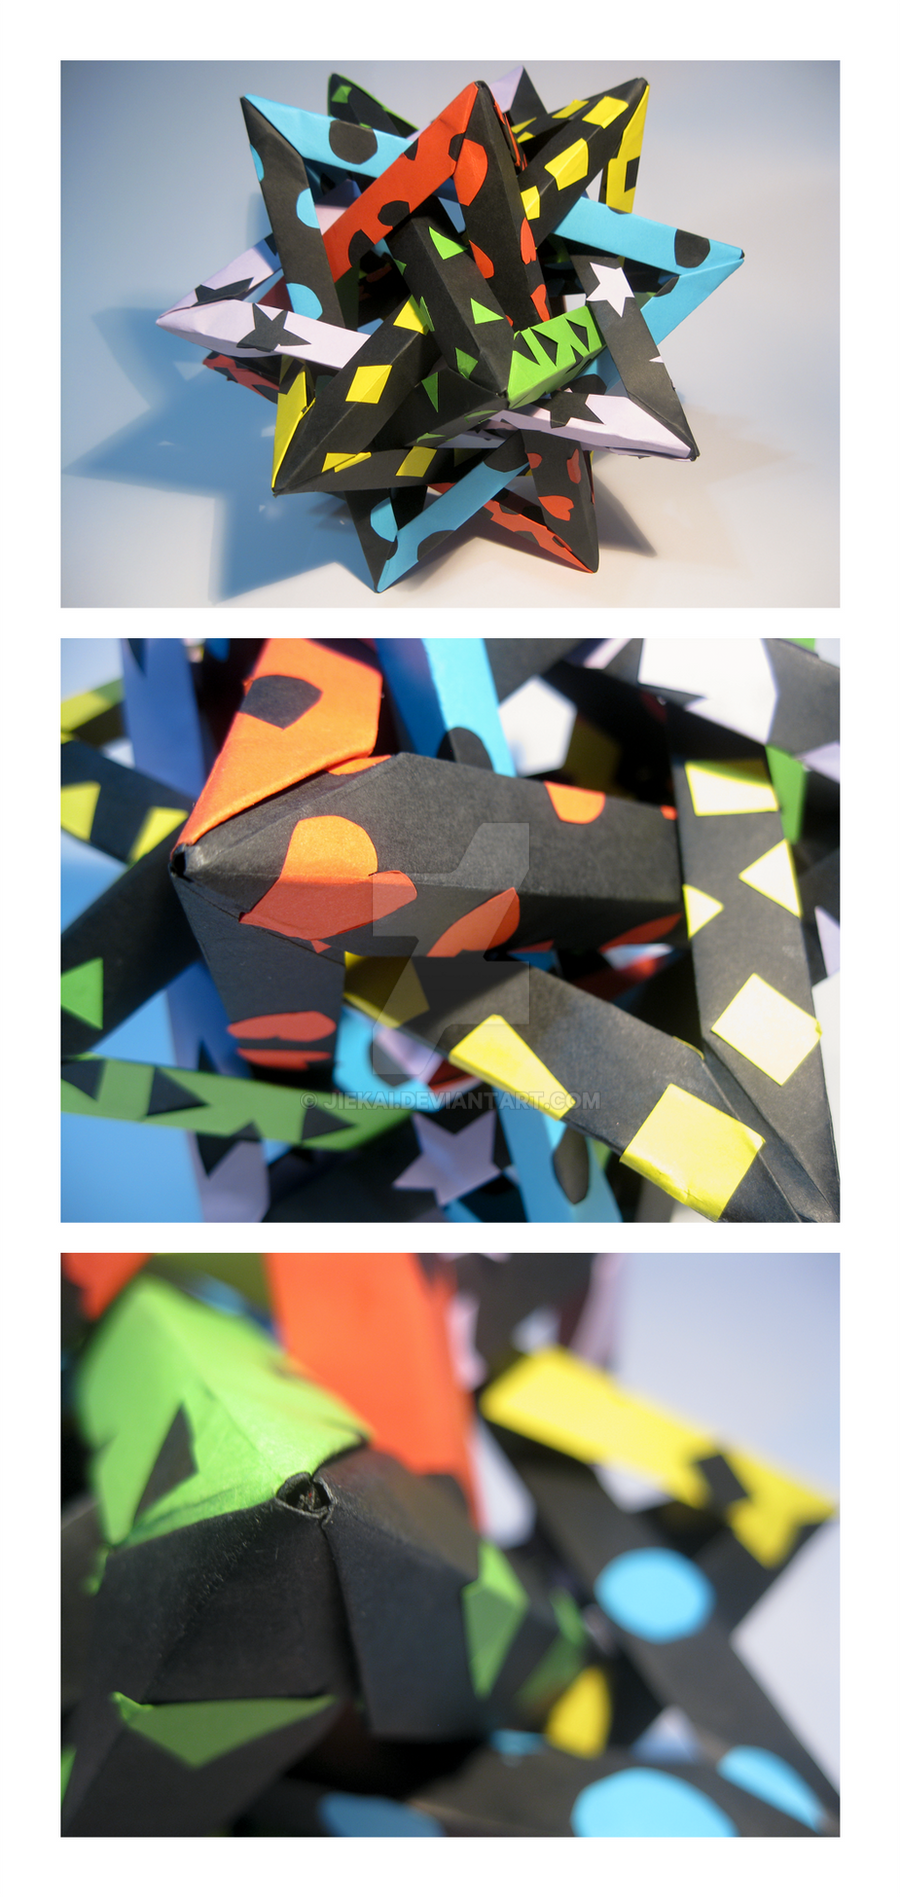 Variety by Jiekai